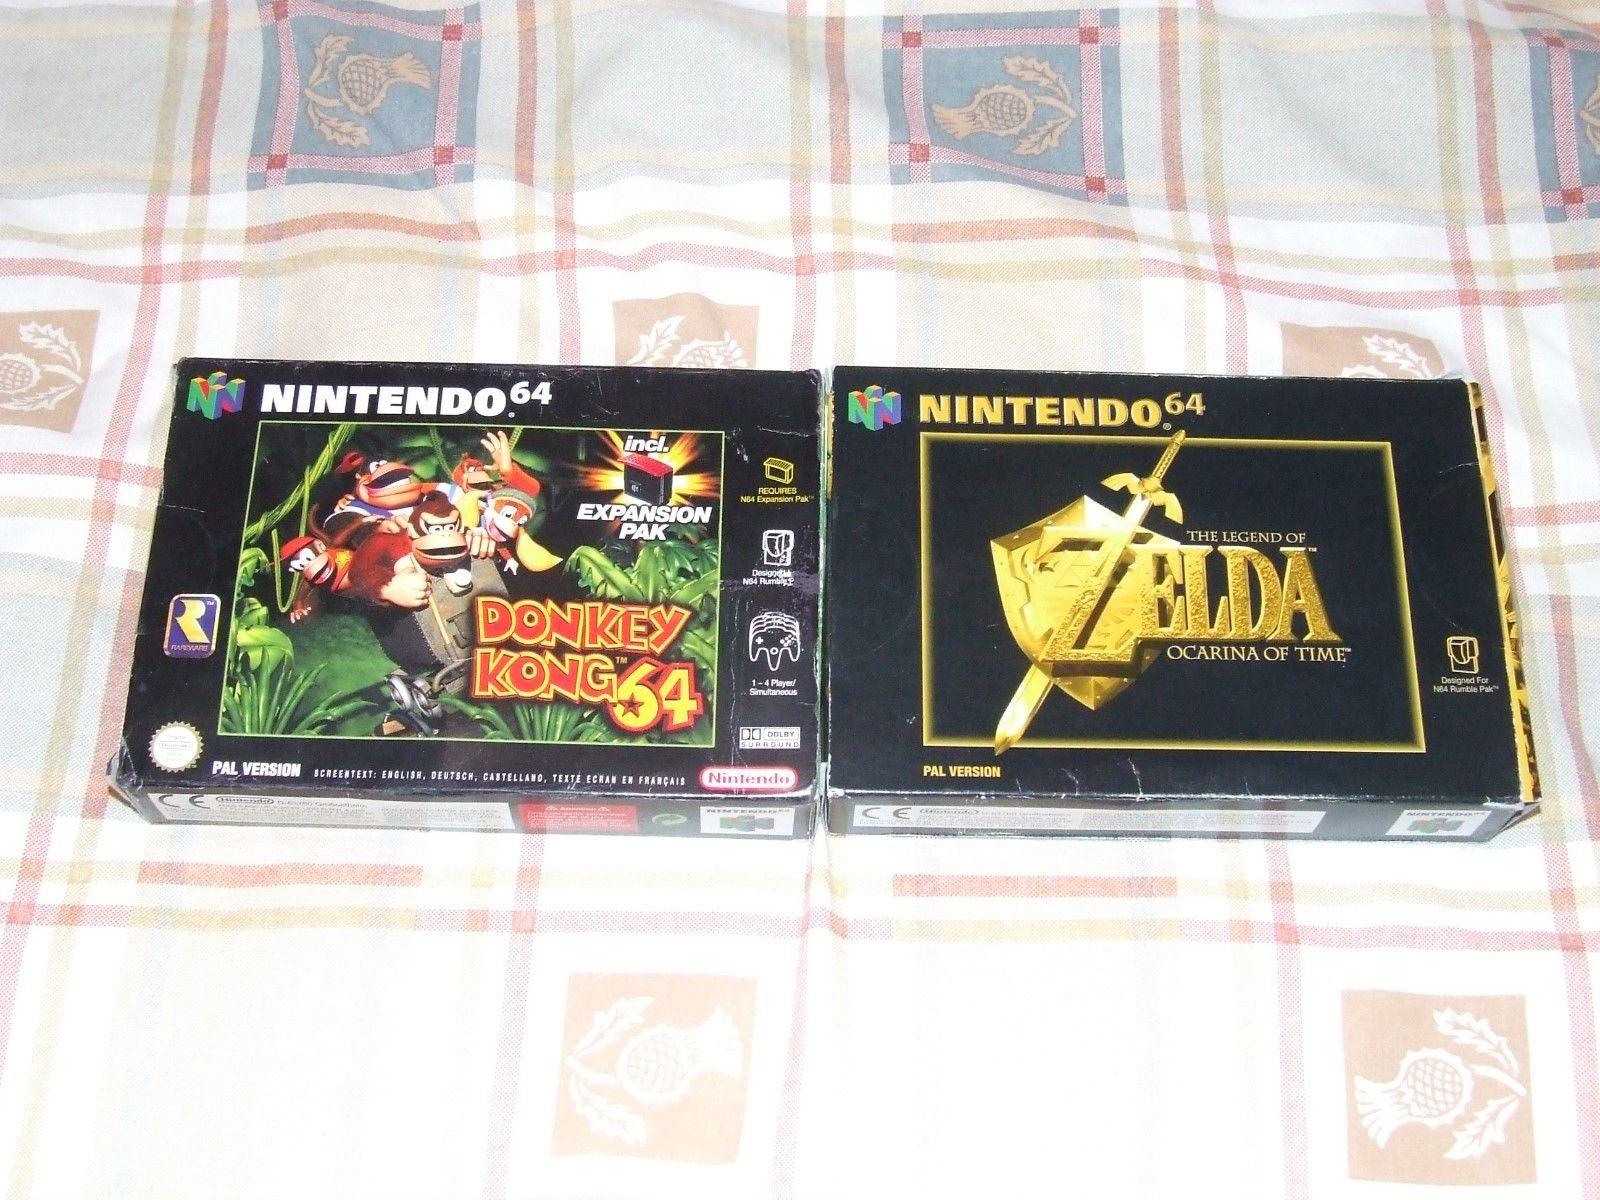 Zelda Ocarina of Time e Donkey Kong 64 asta